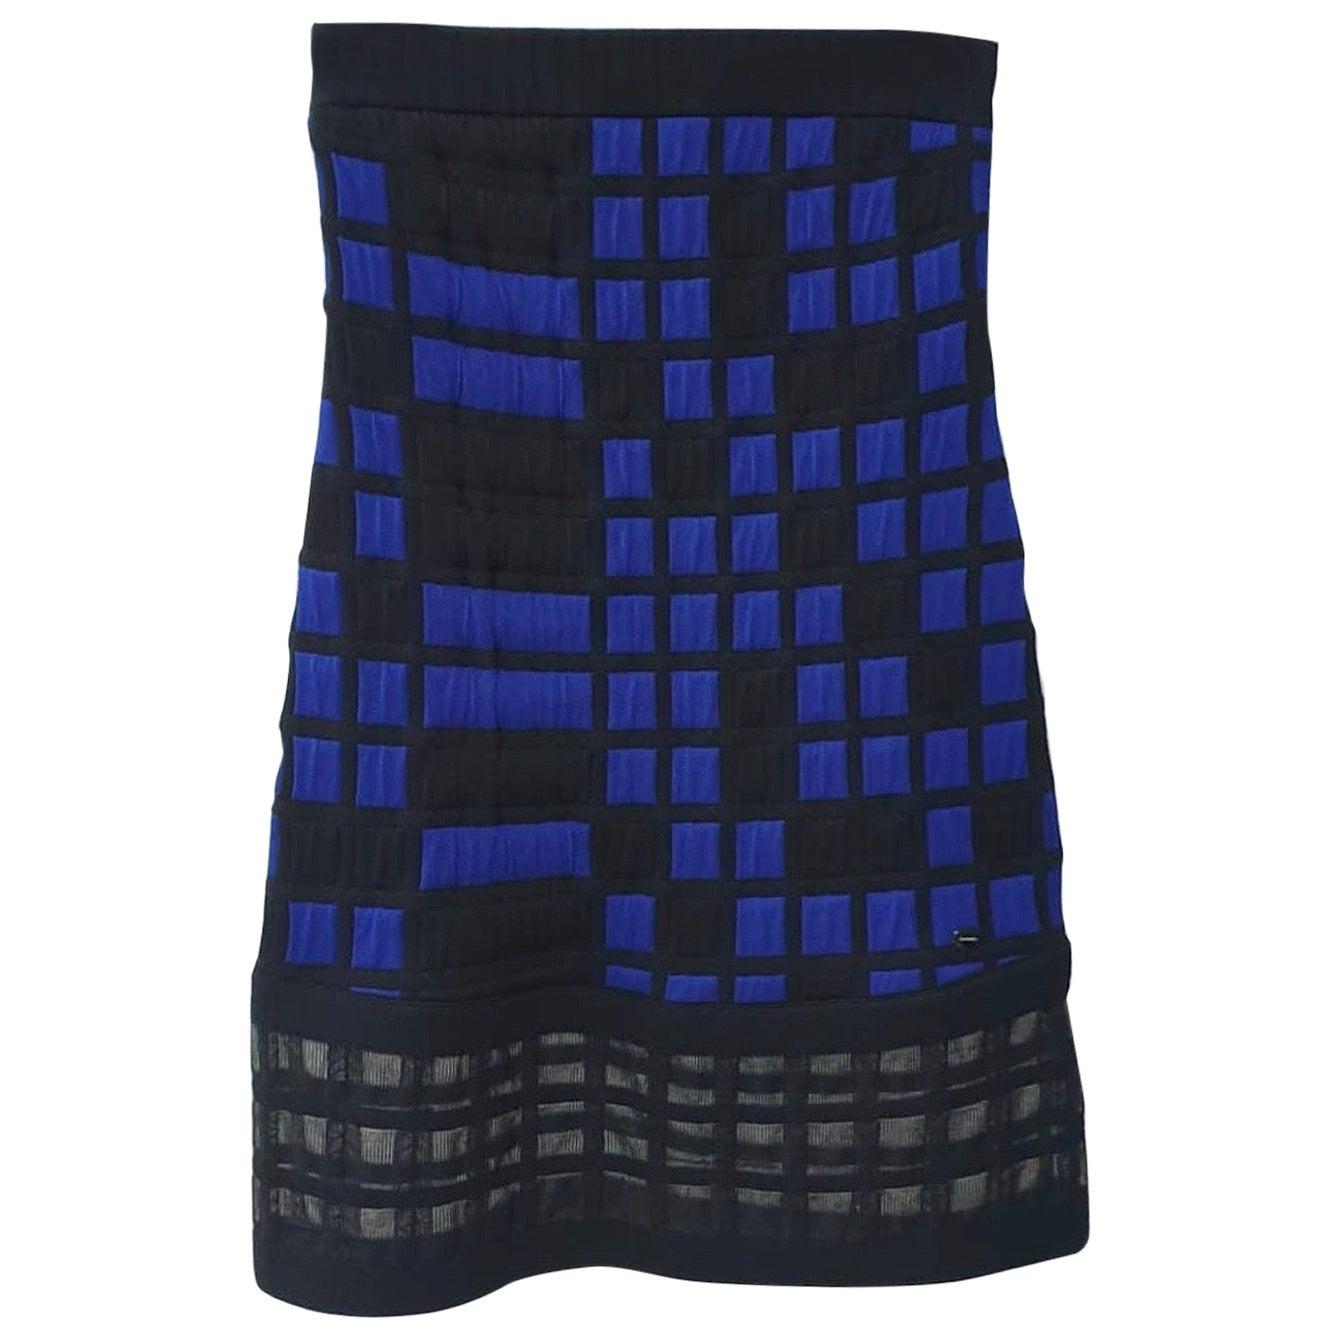 CHANEL 2013 Blue Black Checkered Dress